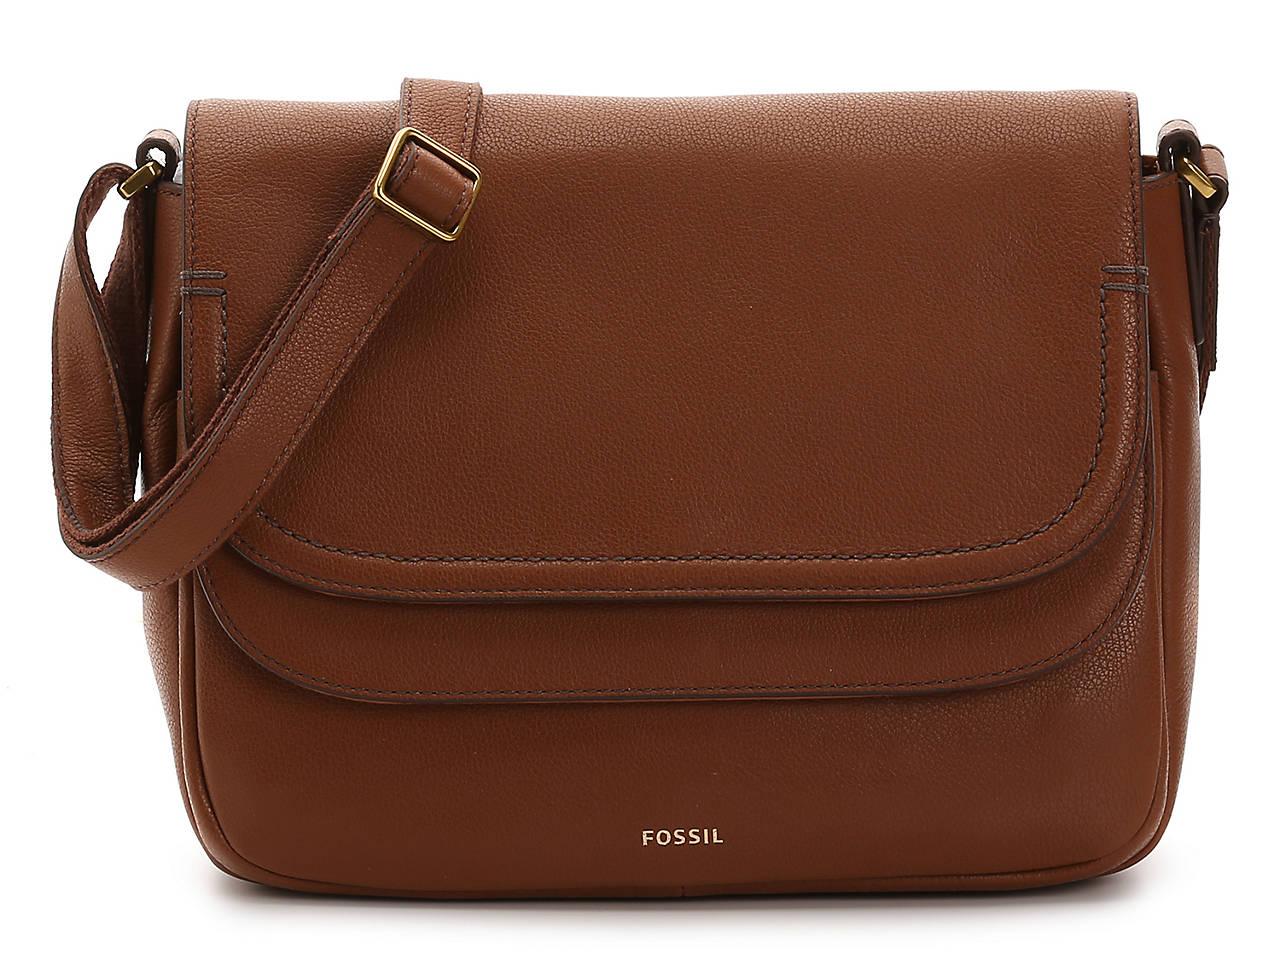 ccdb461f34e Fossil Peyton Leather Crossbody Bag Women's Handbags & Accessories | DSW